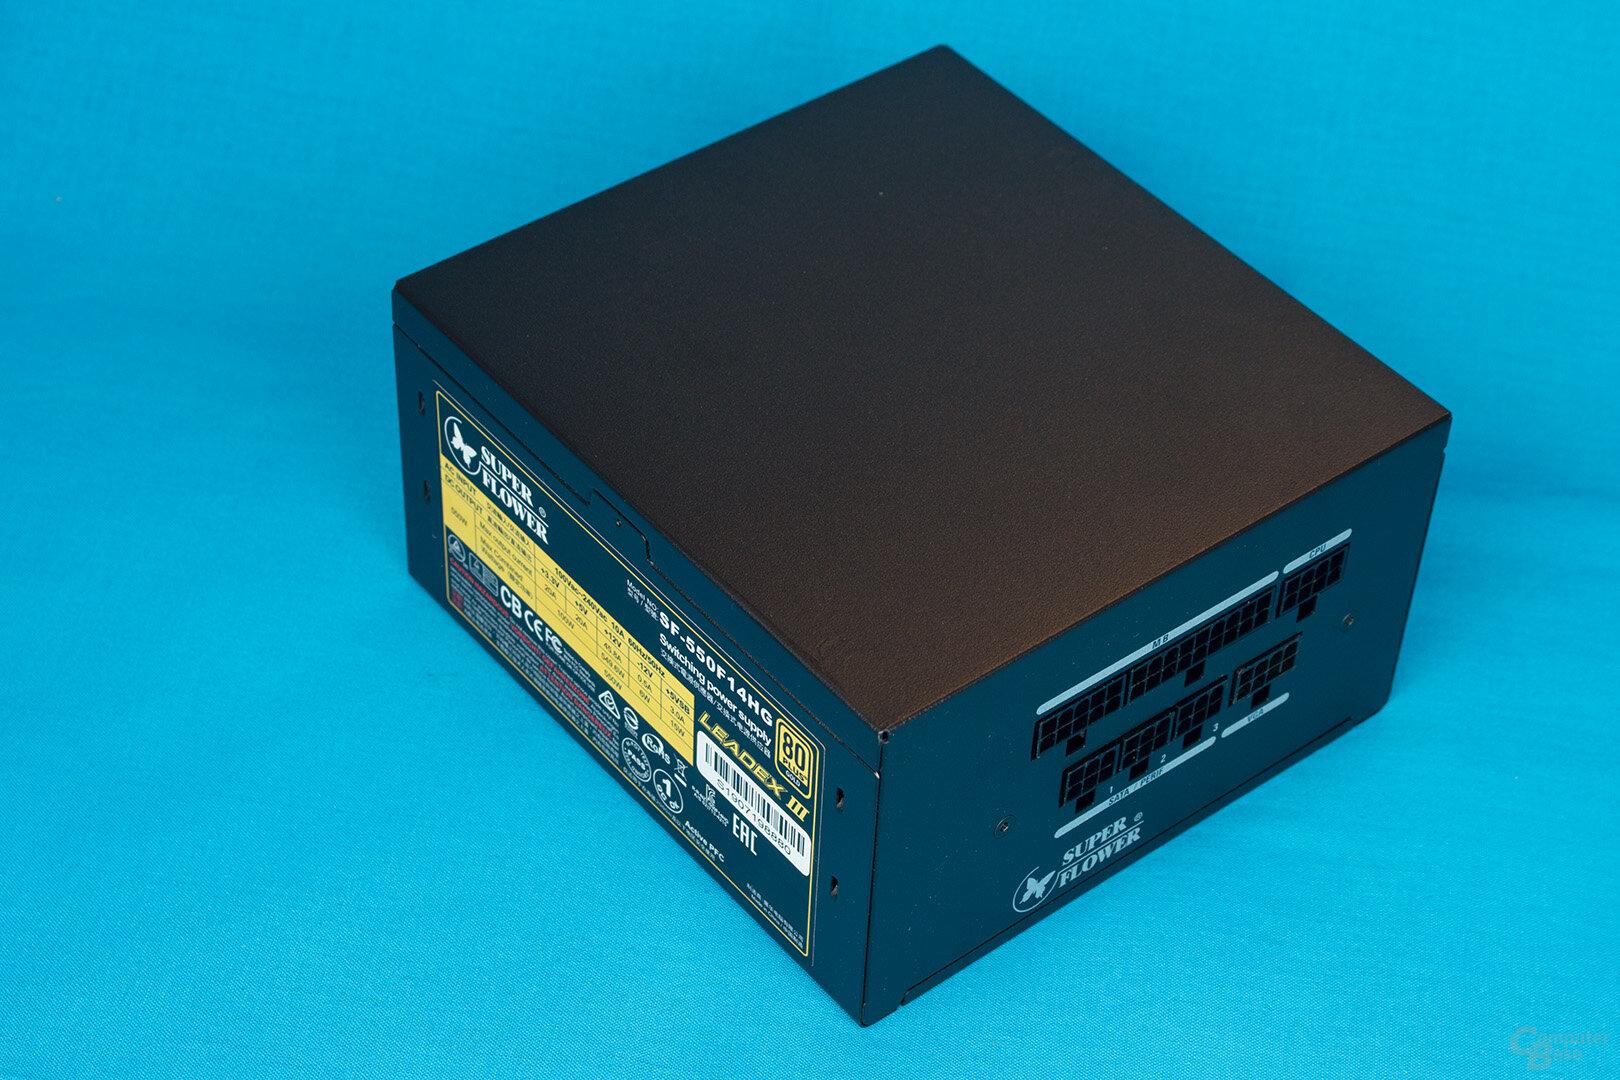 Super Flower Leadex III Gold 550W